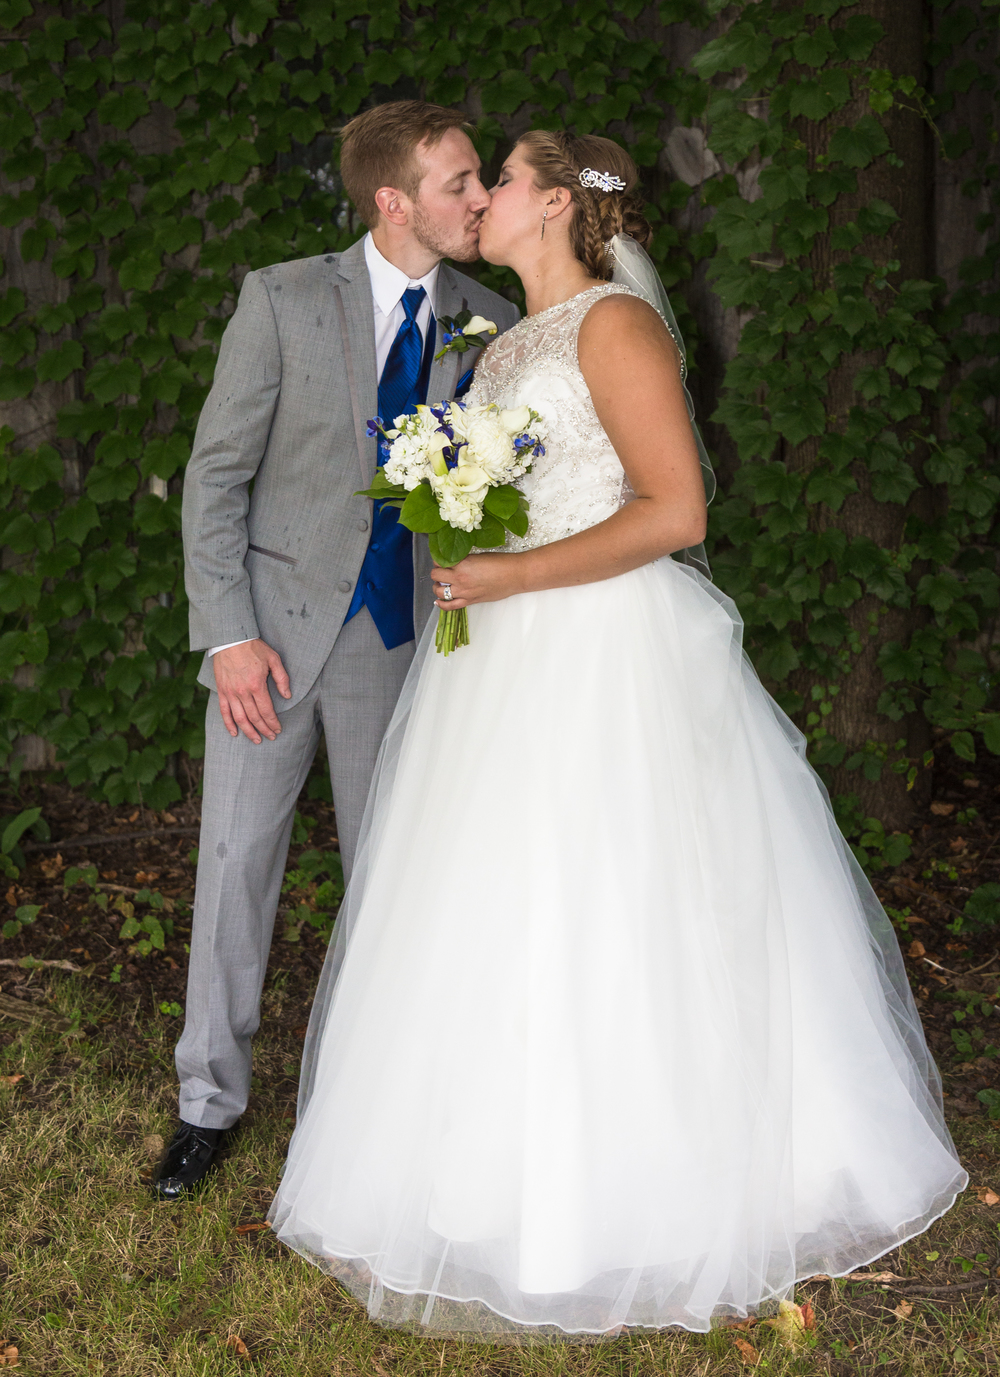 Brian+Jill Wedding Sneak Peak (54 of 149).jpg